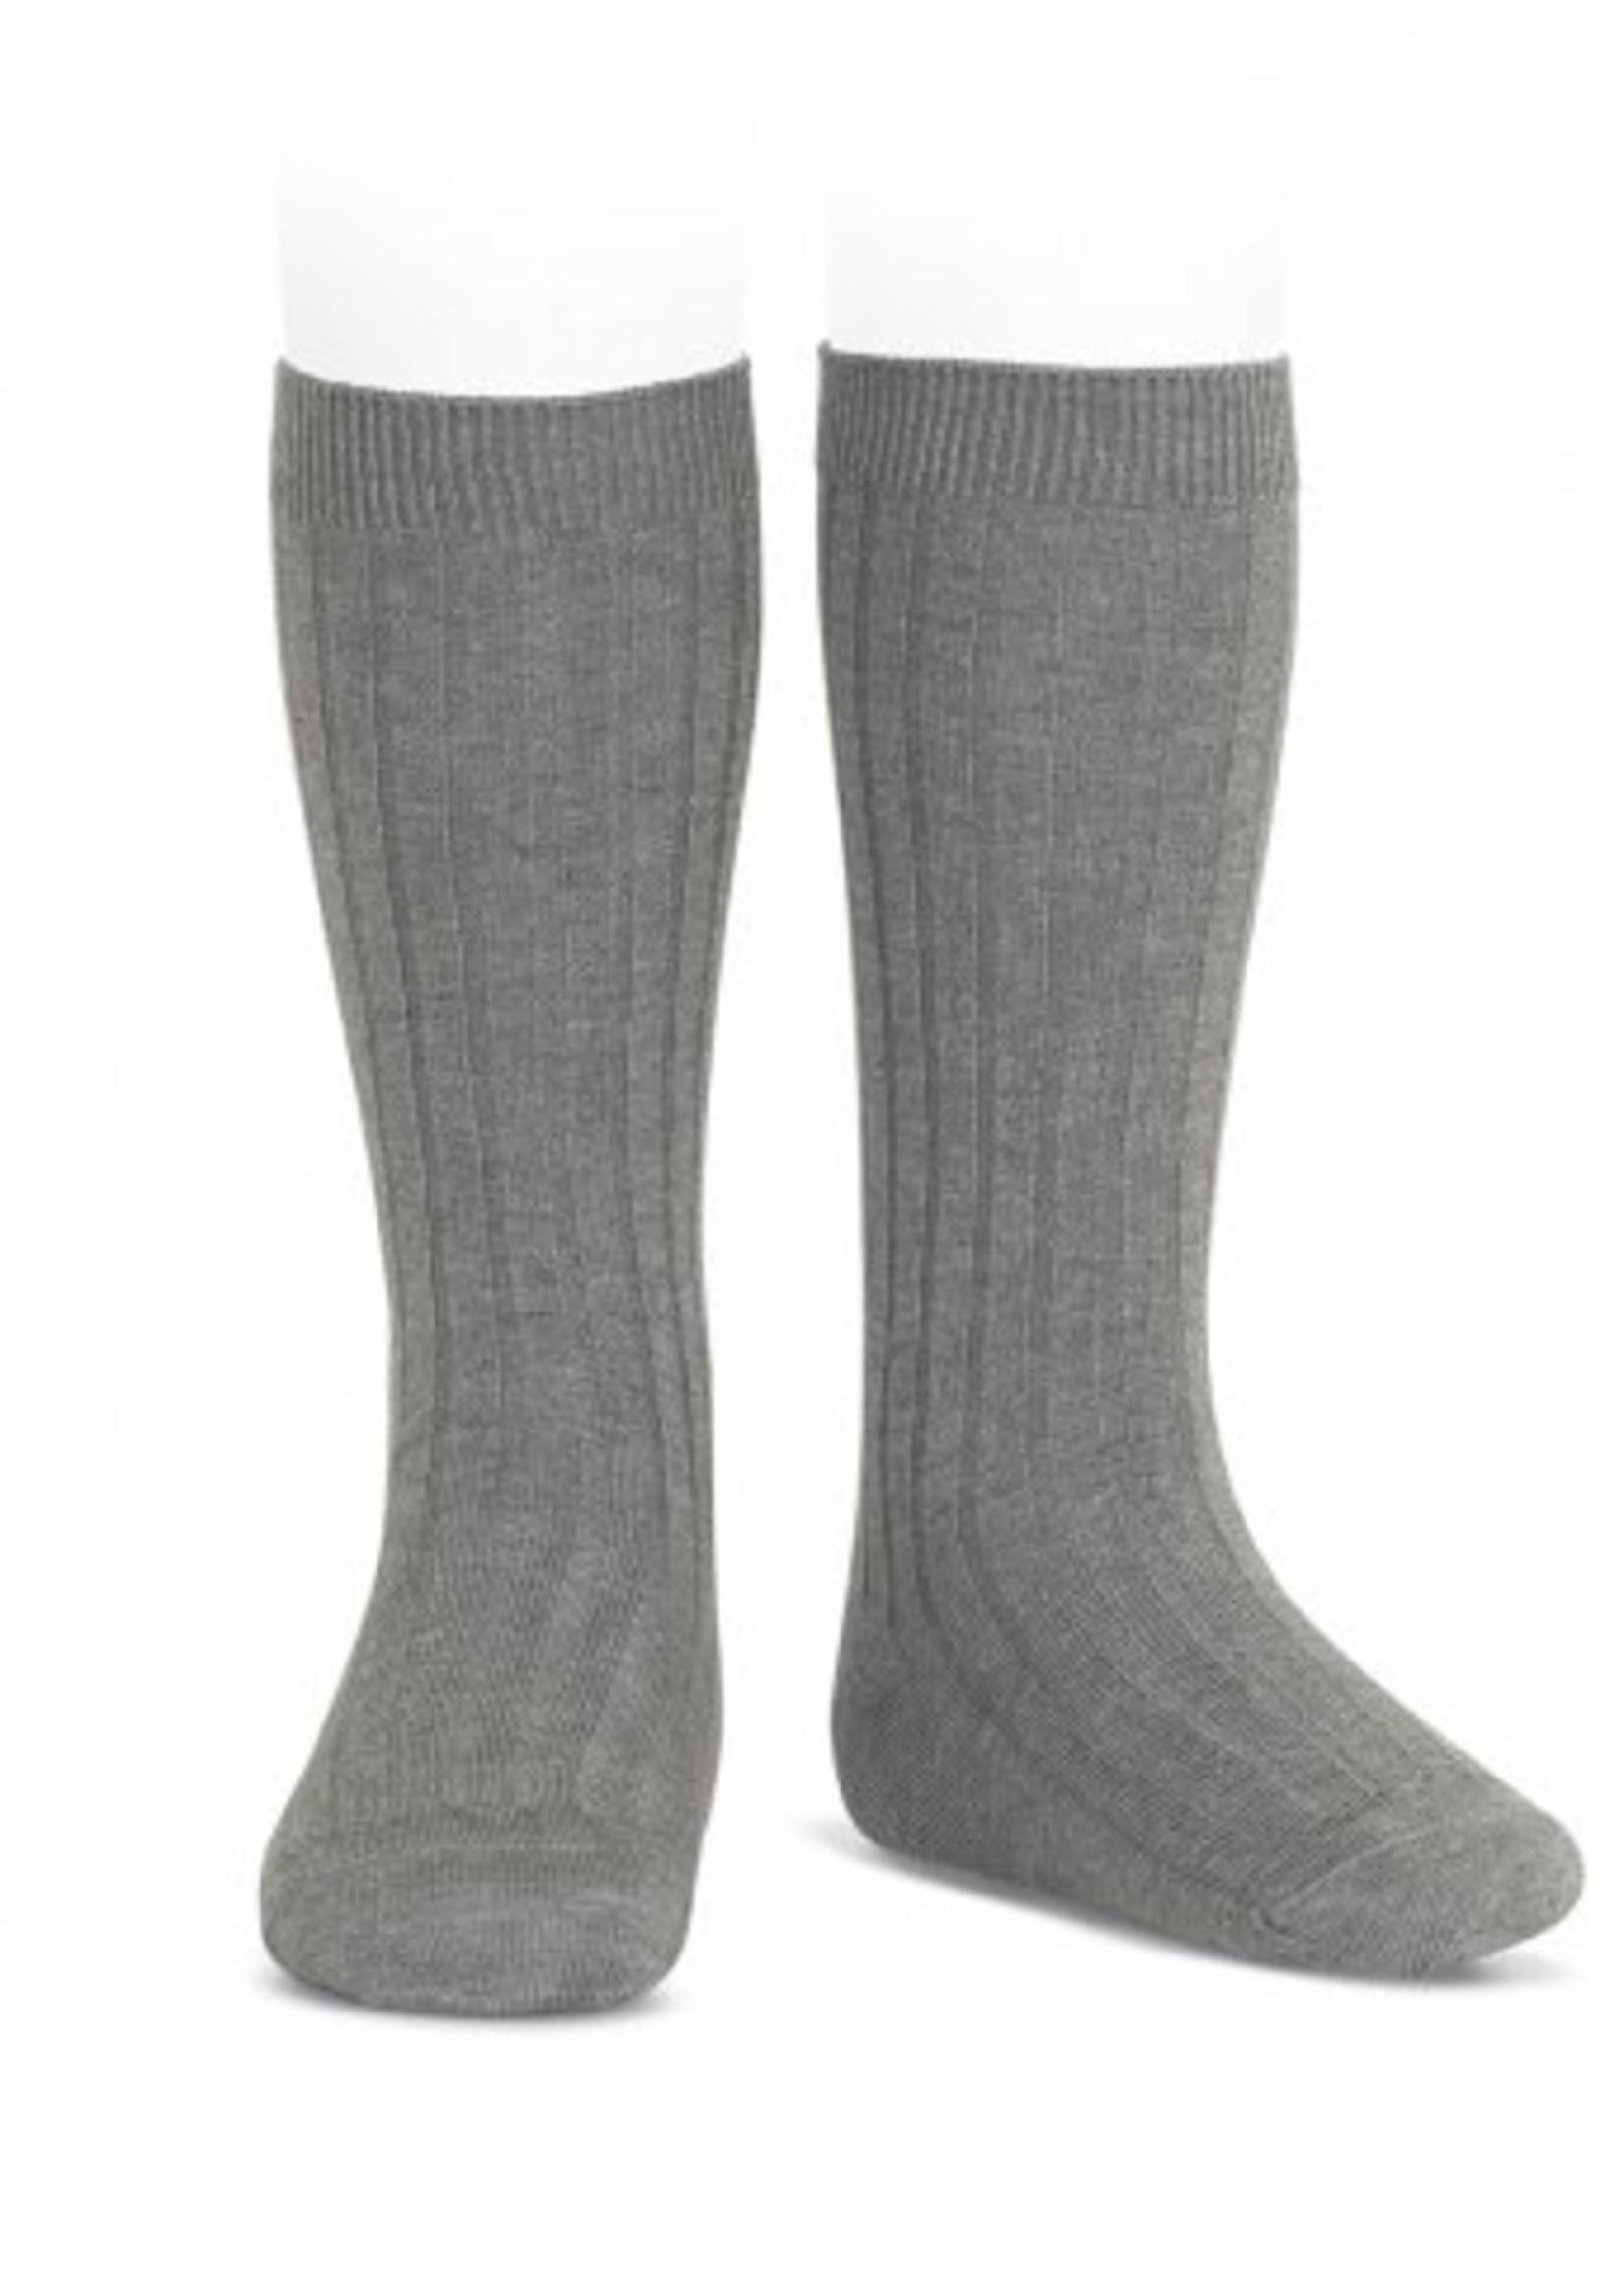 condor Condor Wide Rib Basic Knee High Socks